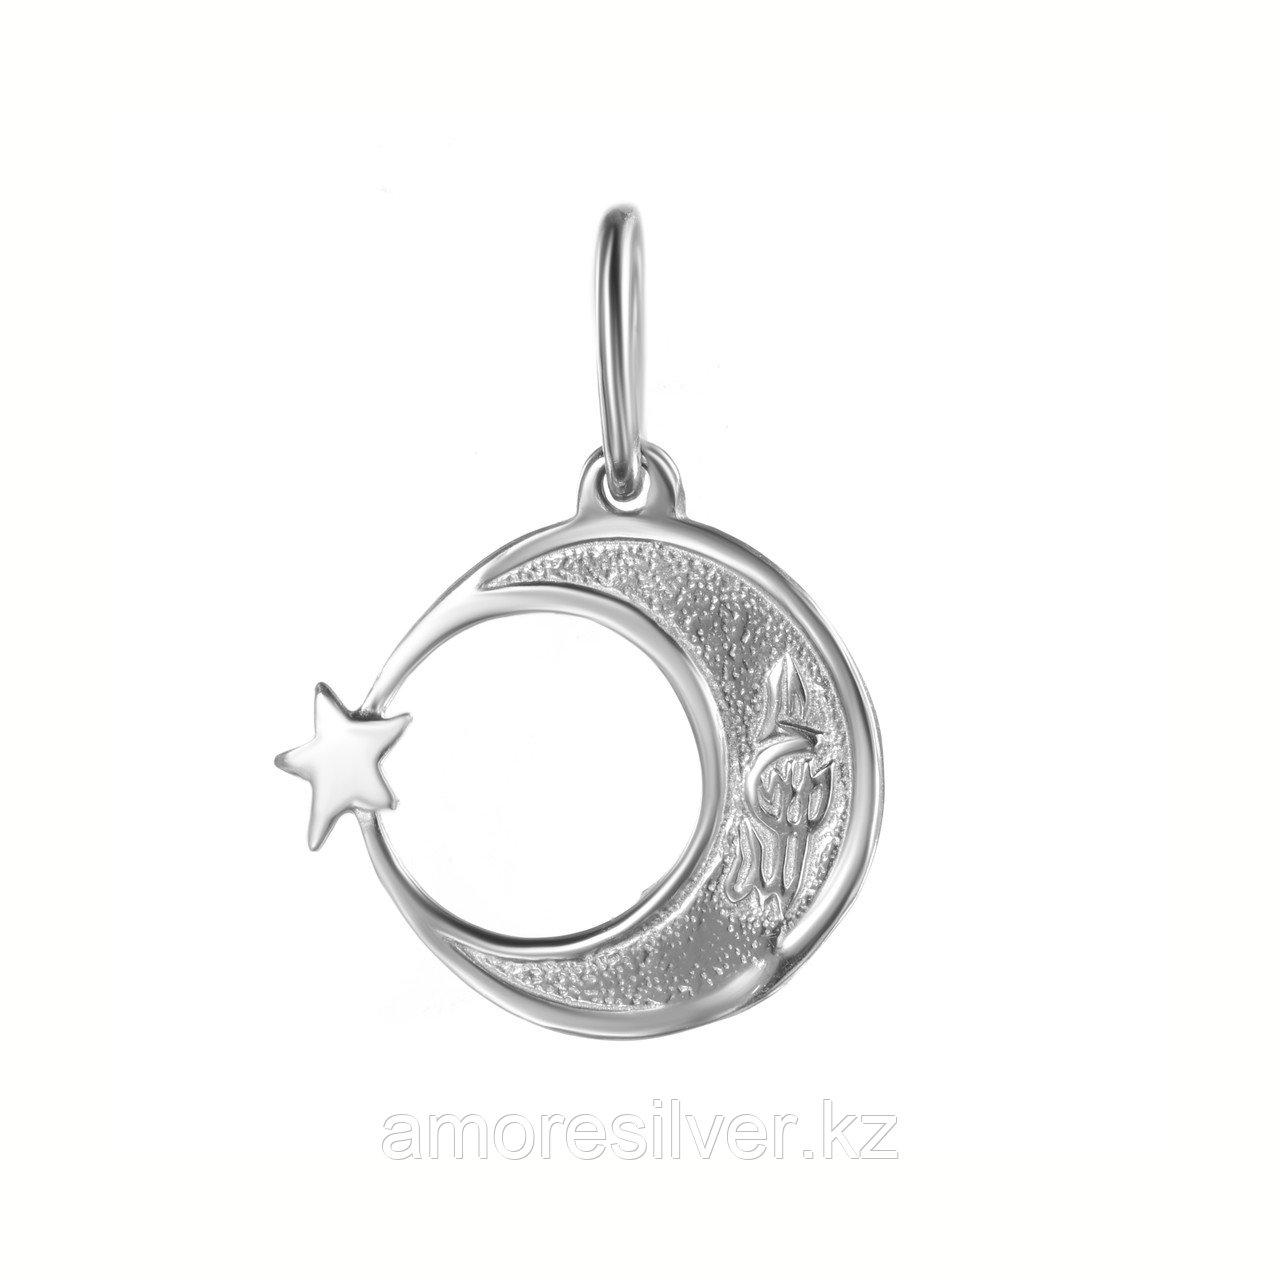 SOKOLOV серебро с родием, фианит юи 132009р